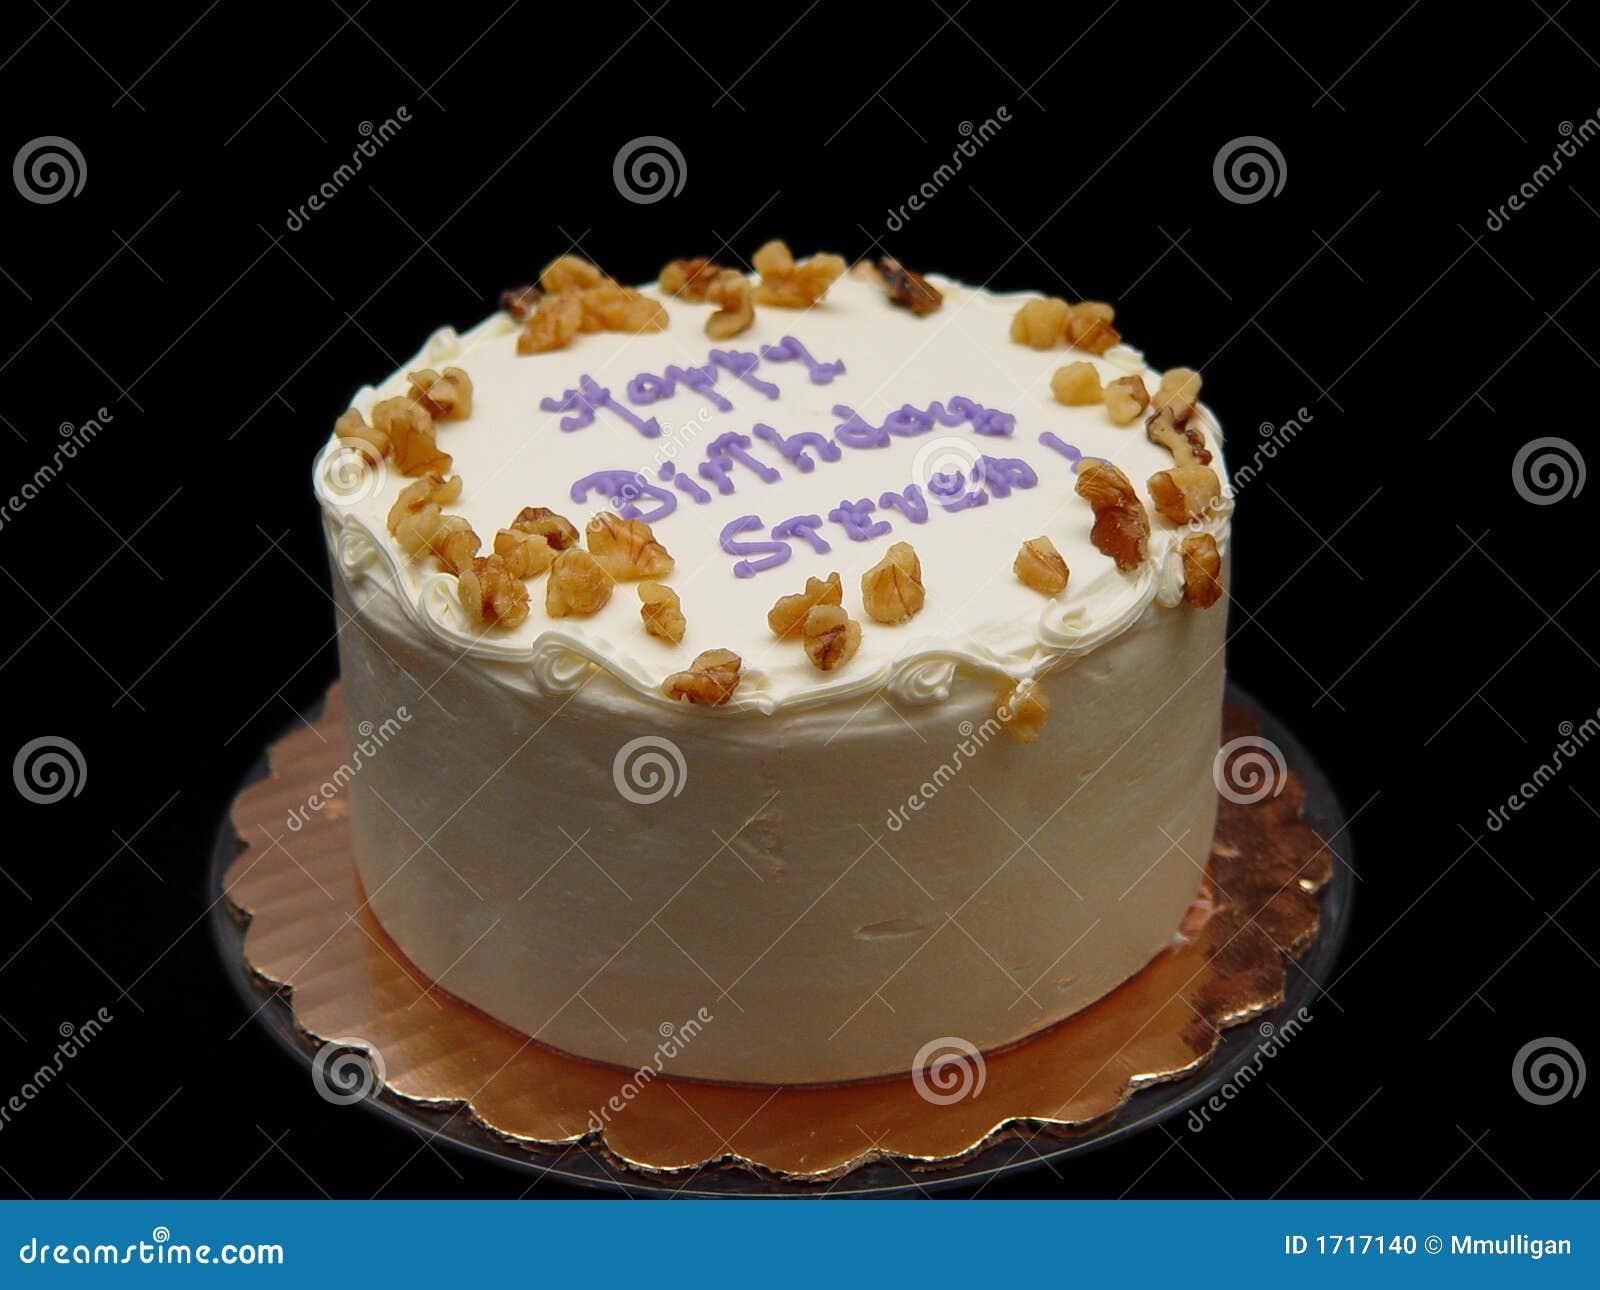 Happy Birthday Steven Cake Images